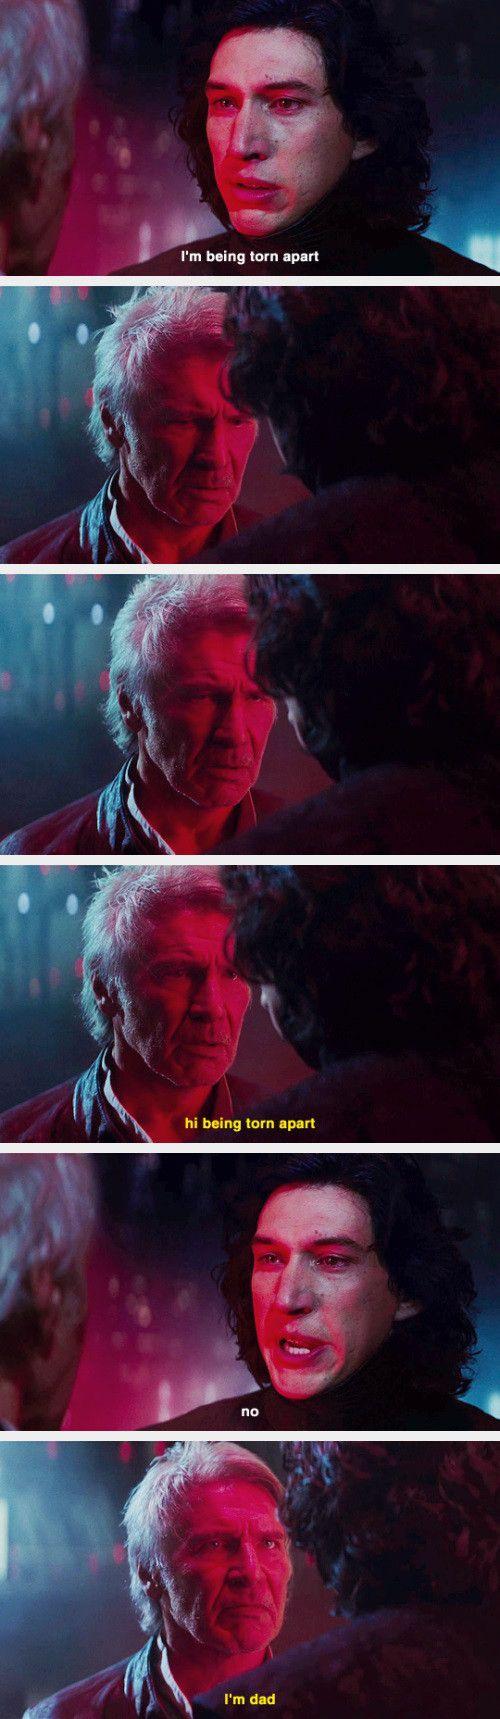 Harrison Ford S Injury During Star Wars The Force Awakens Saved It Star Wars Humor Star Wars Memes Star Wars